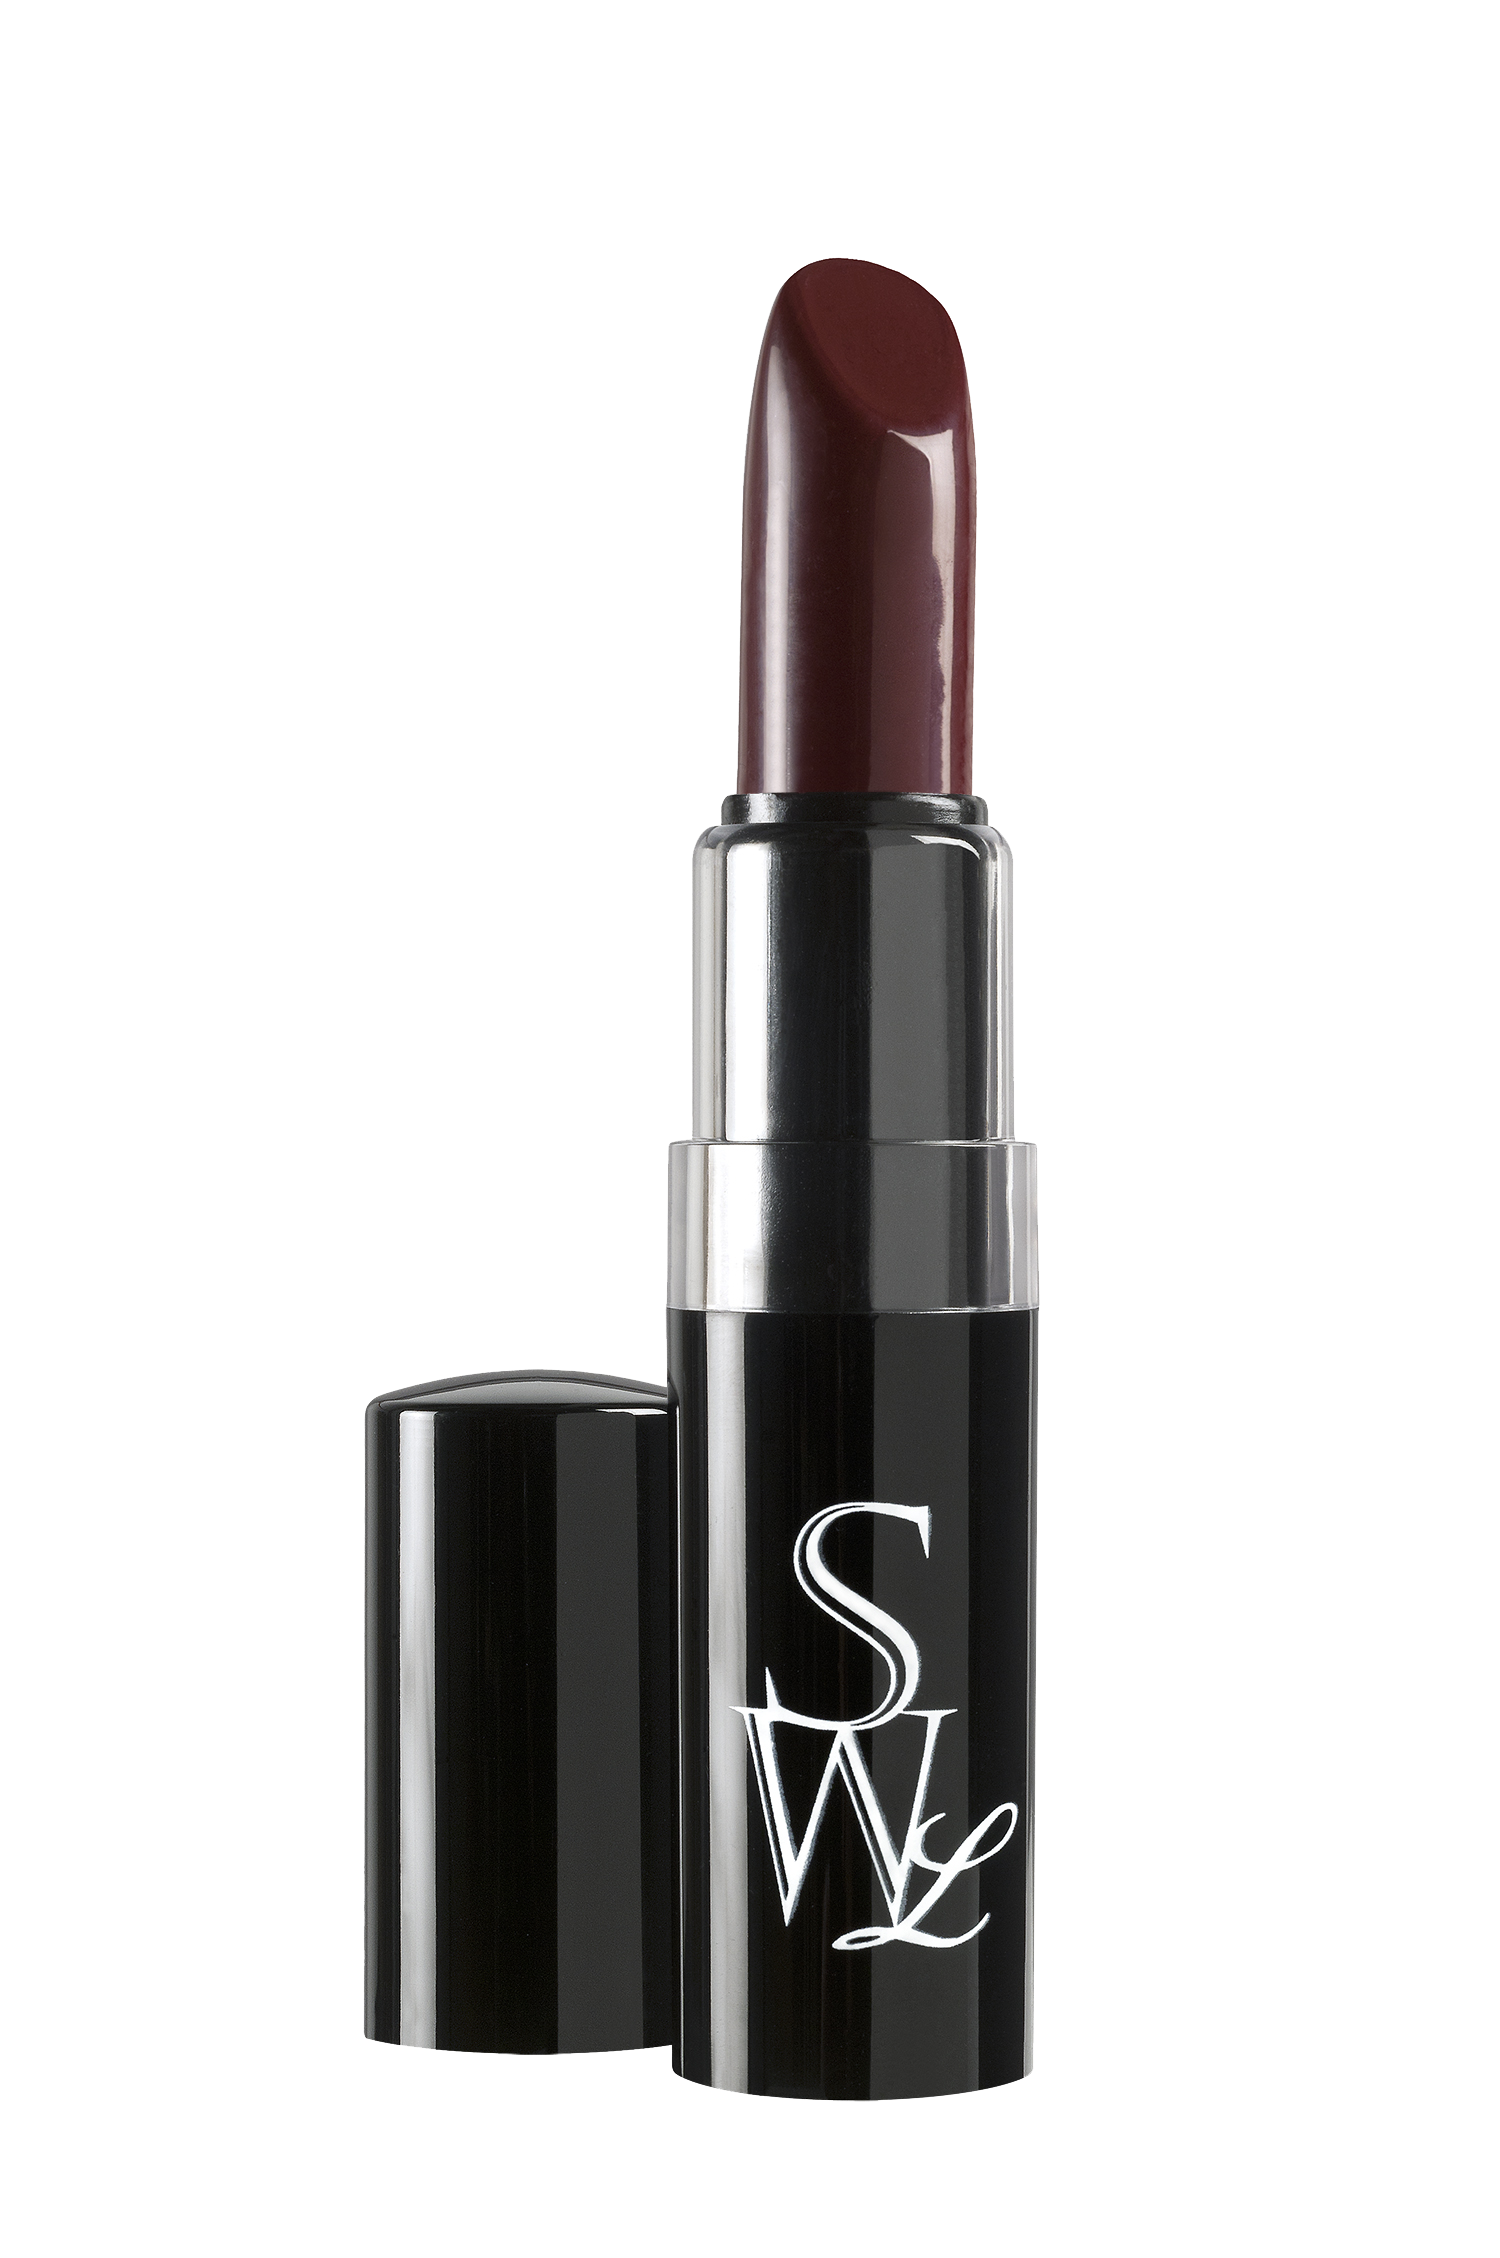 SWL Beauty Crème Lipstick $13.99